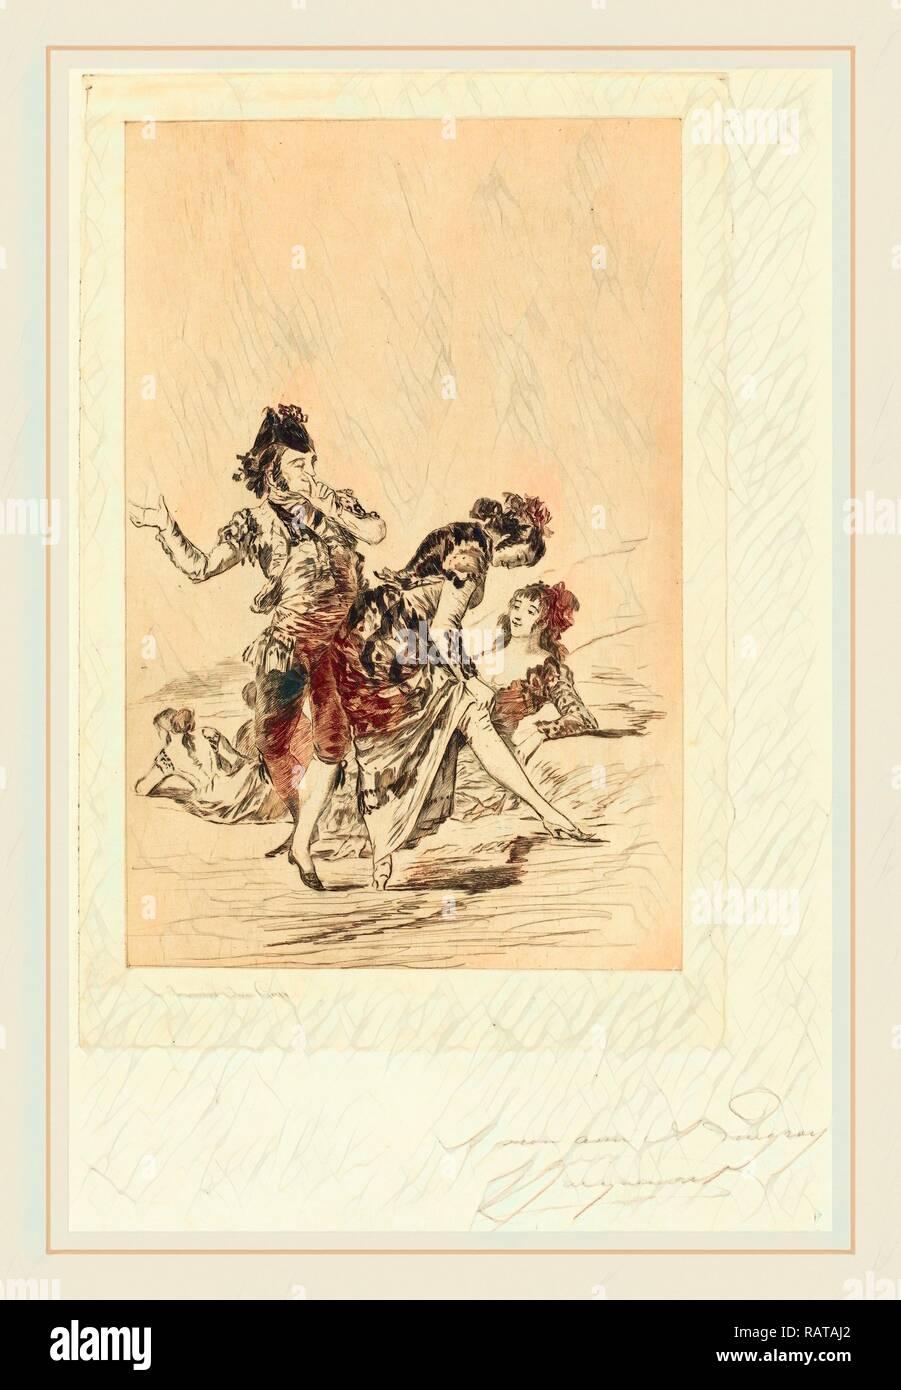 Jules-Ferdinand Jacquemart after Francisco de Goya (French, 1837-1880), Spanish Scene (Scène espagnole), 1863 reimagined - Stock Image